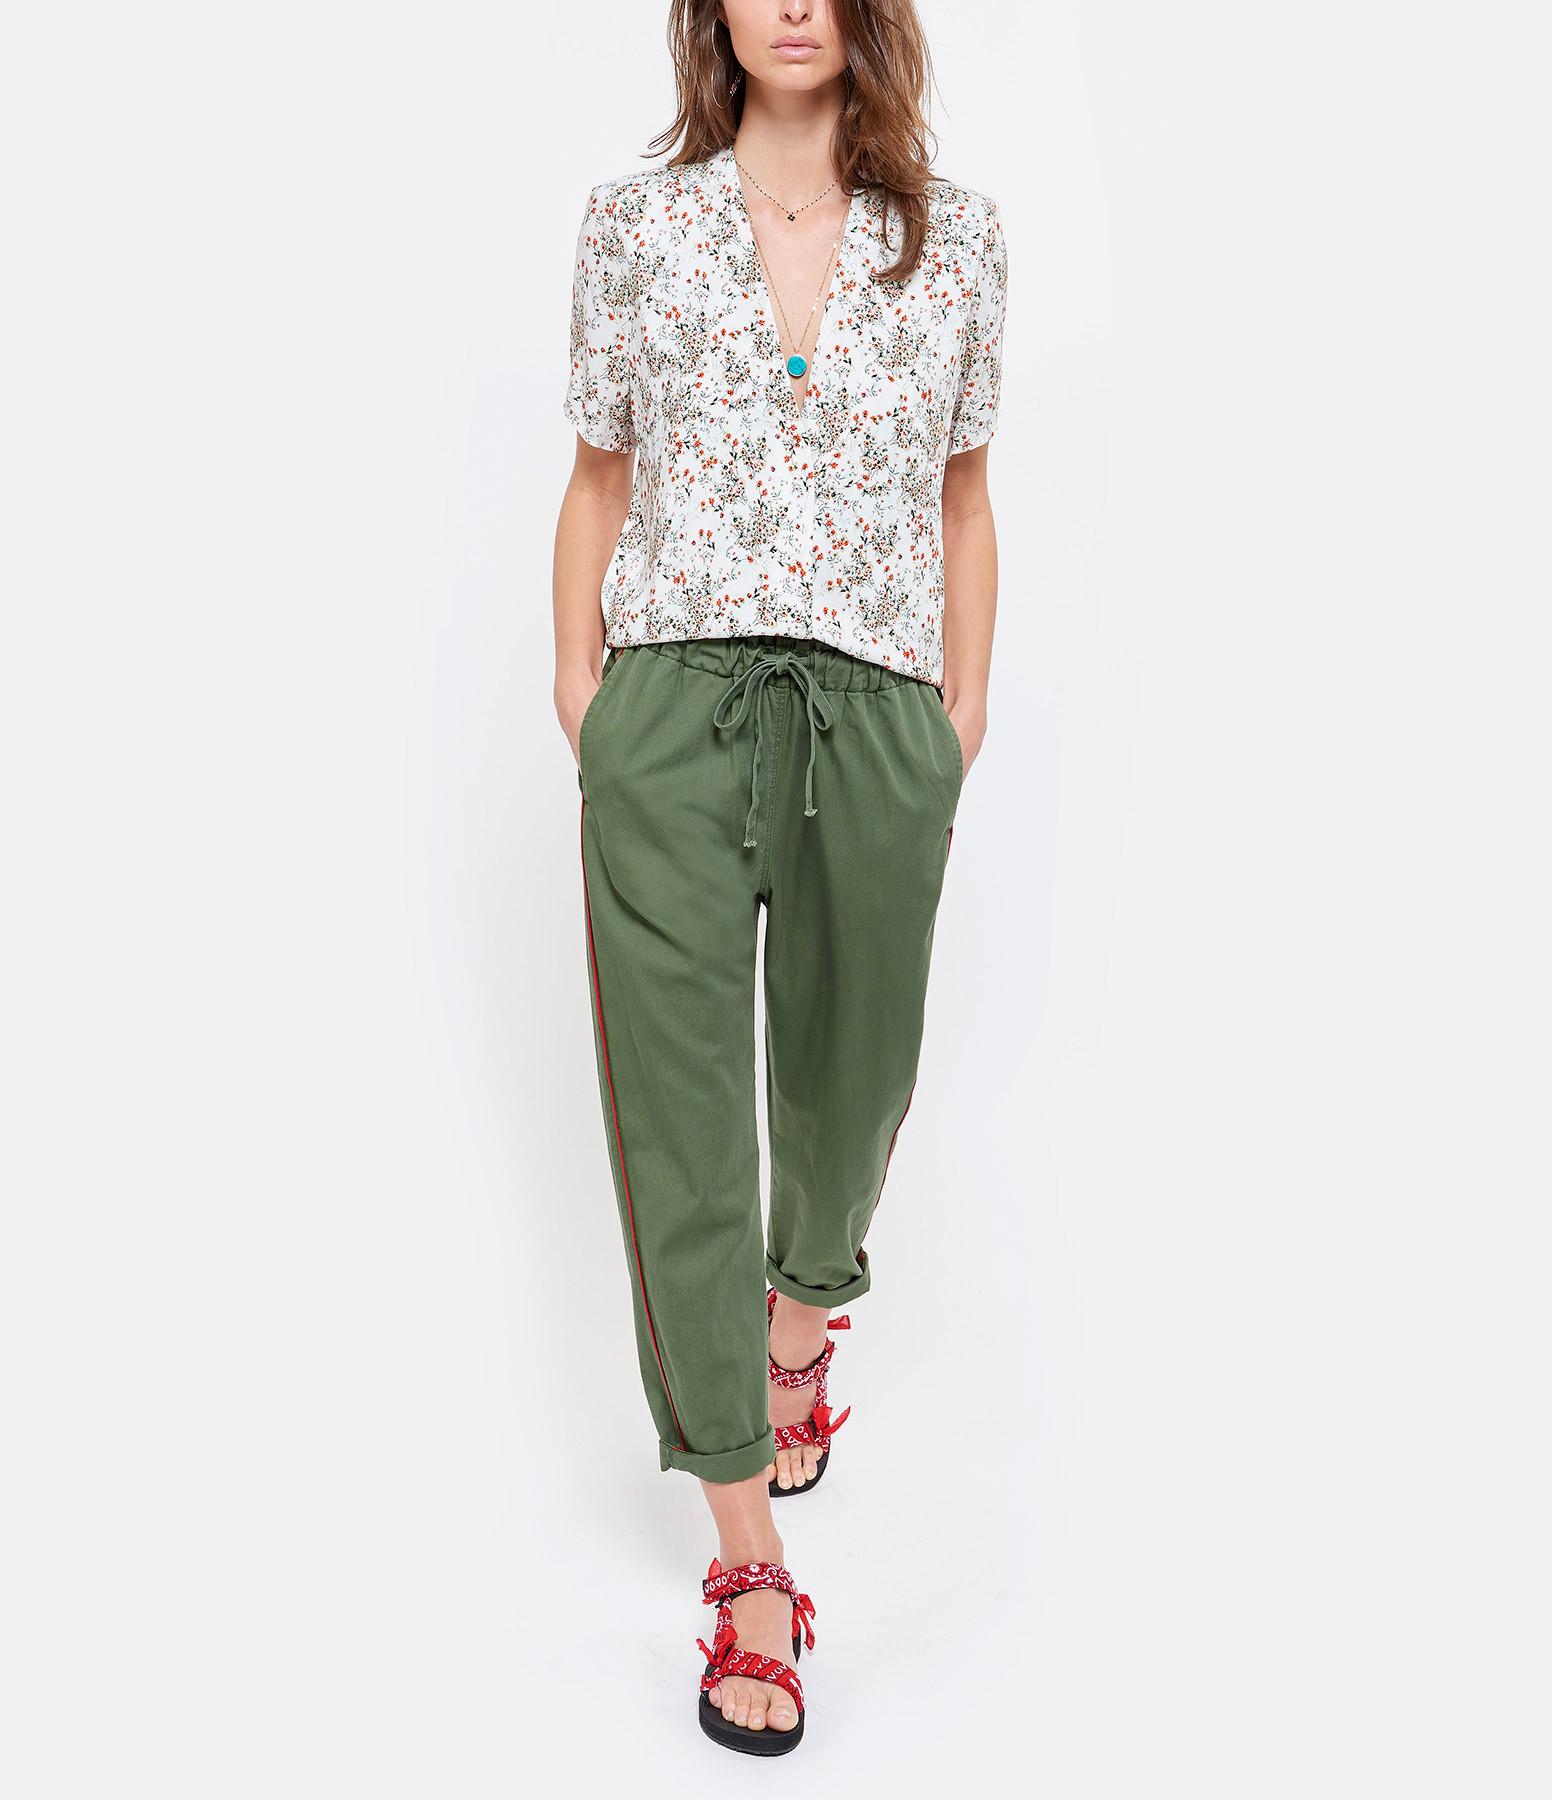 XIRENA - Pantalon Rex Coton Twill Vert